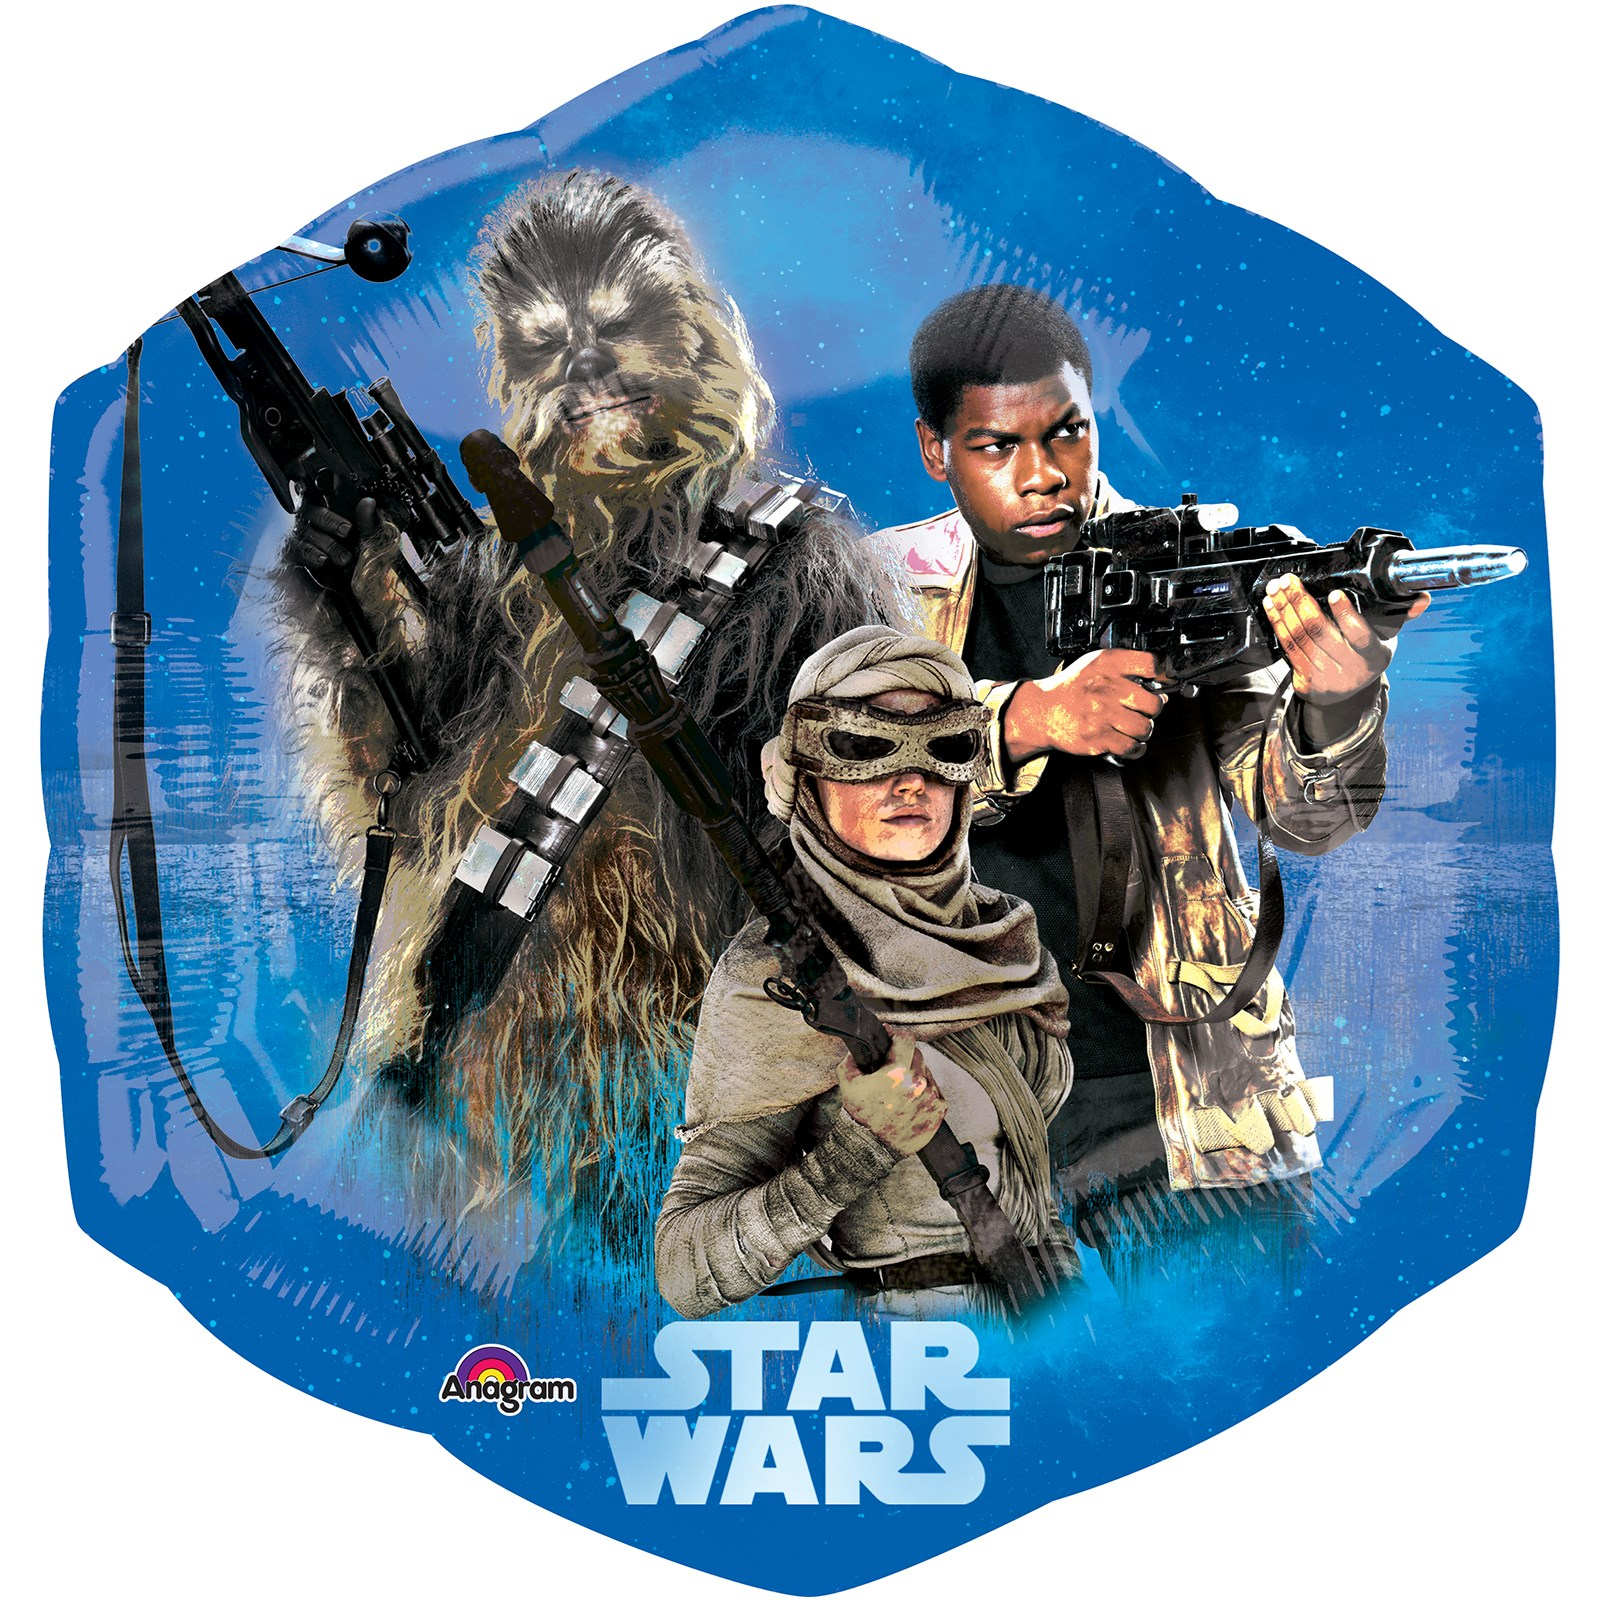 Star Wars 7 The Force Awakens Supershape Foil Balloon